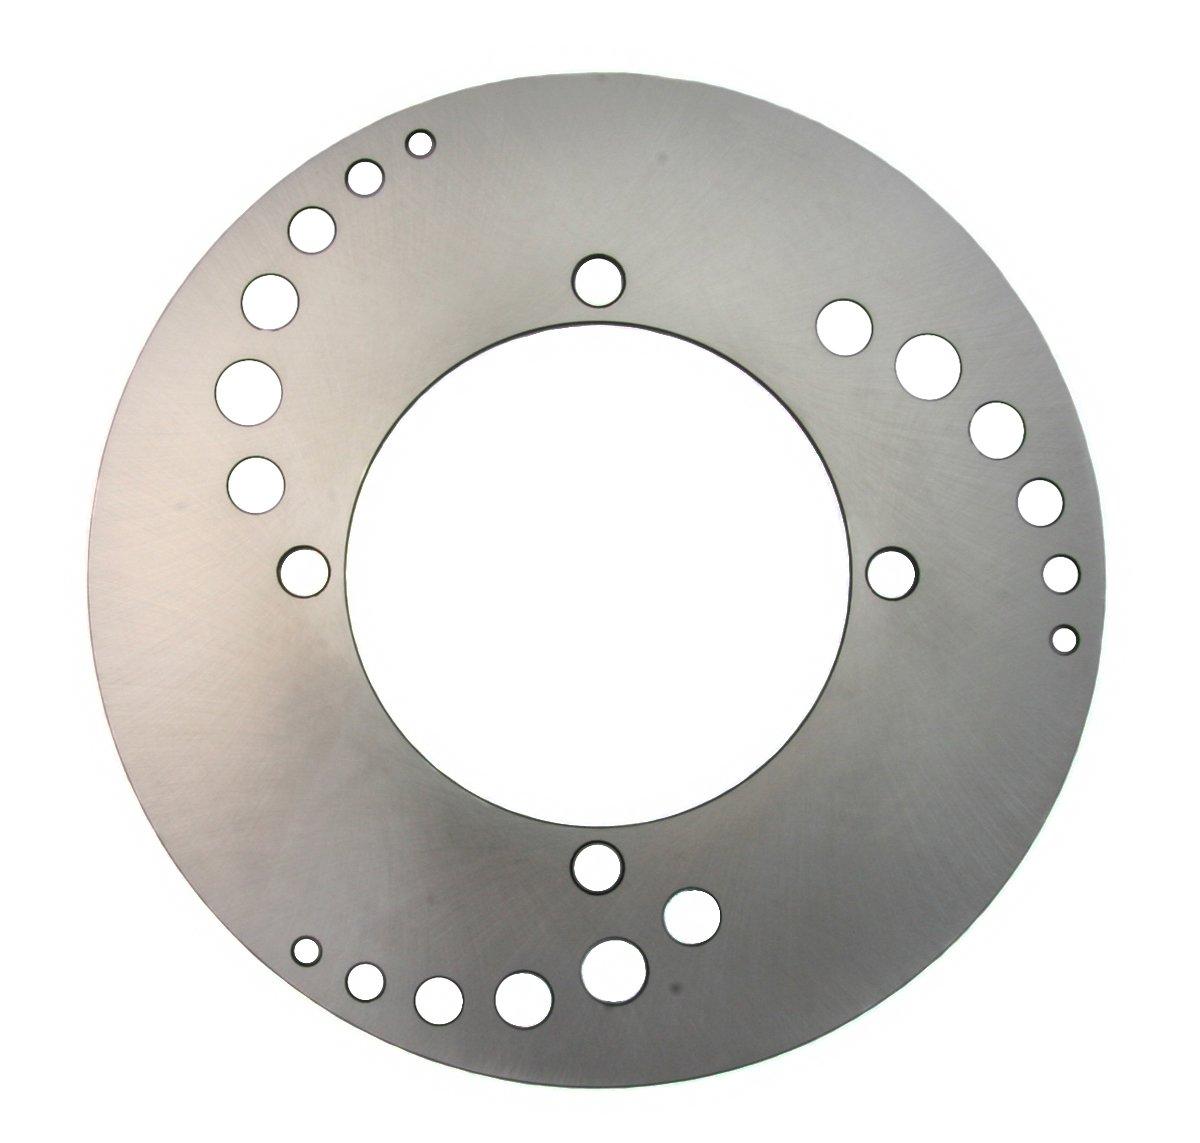 X Baja Rear Disc Brake Rotor /& Semi-Metallic Brake Pads 2000-2007 Can-Am DS650